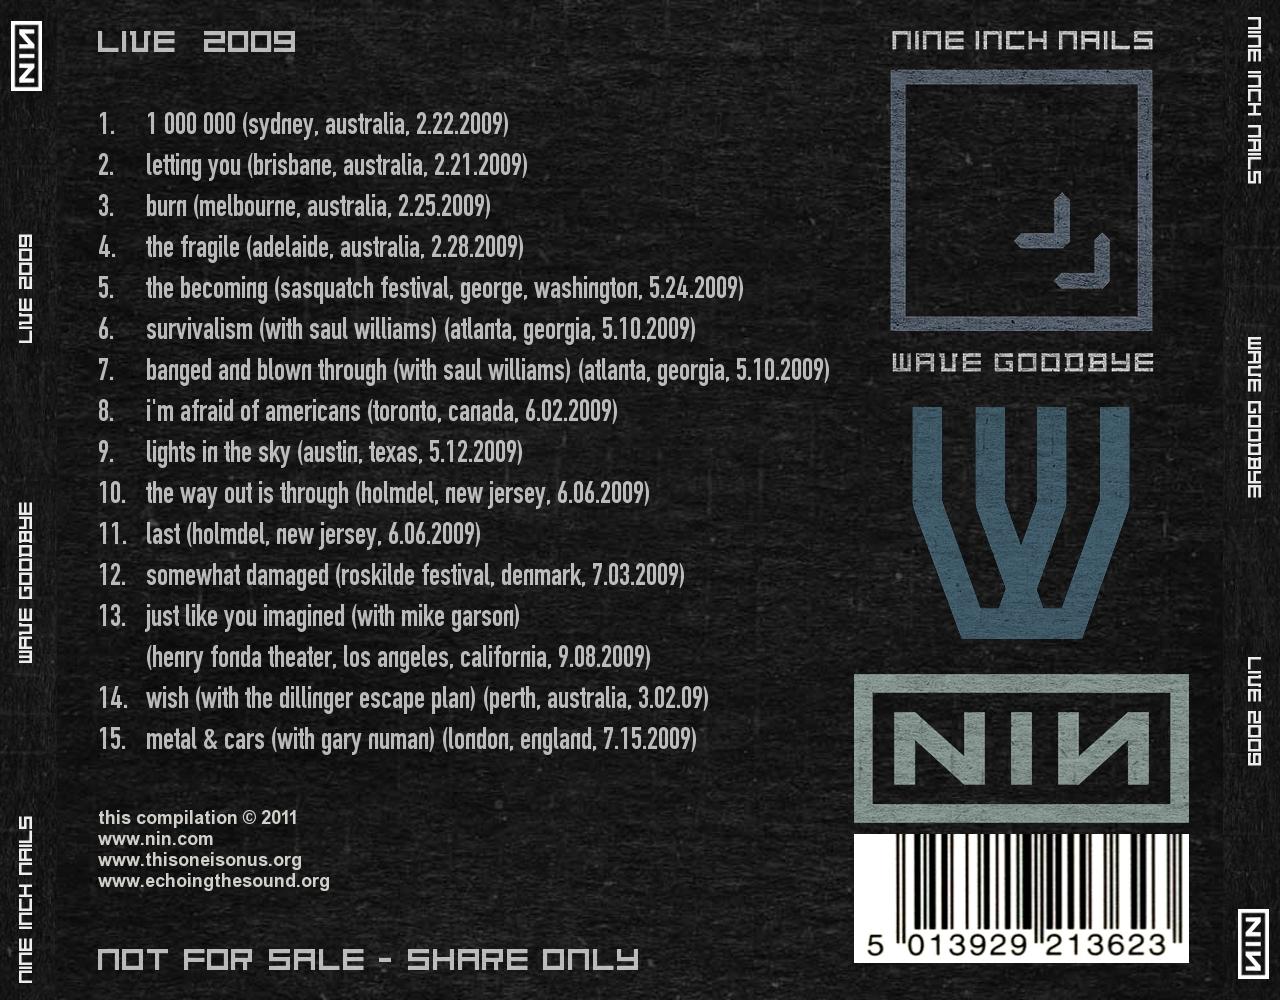 DARK CIRCLE ROOM: RE-UPLOAD: Nine Inch Nails - Live 2009 (MP3)